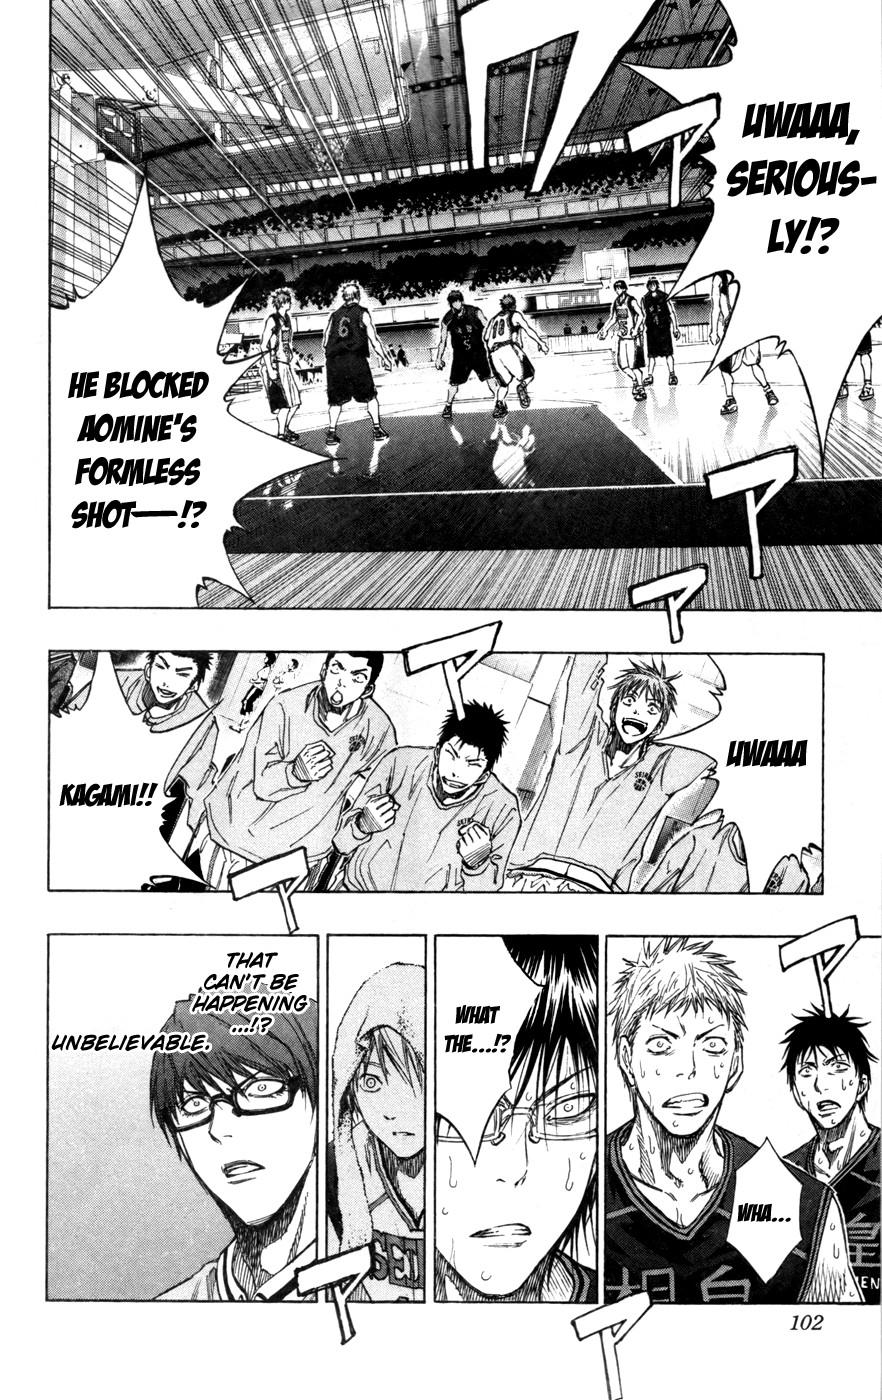 Kuroko no Basket Manga Chapter 122 - Image 17